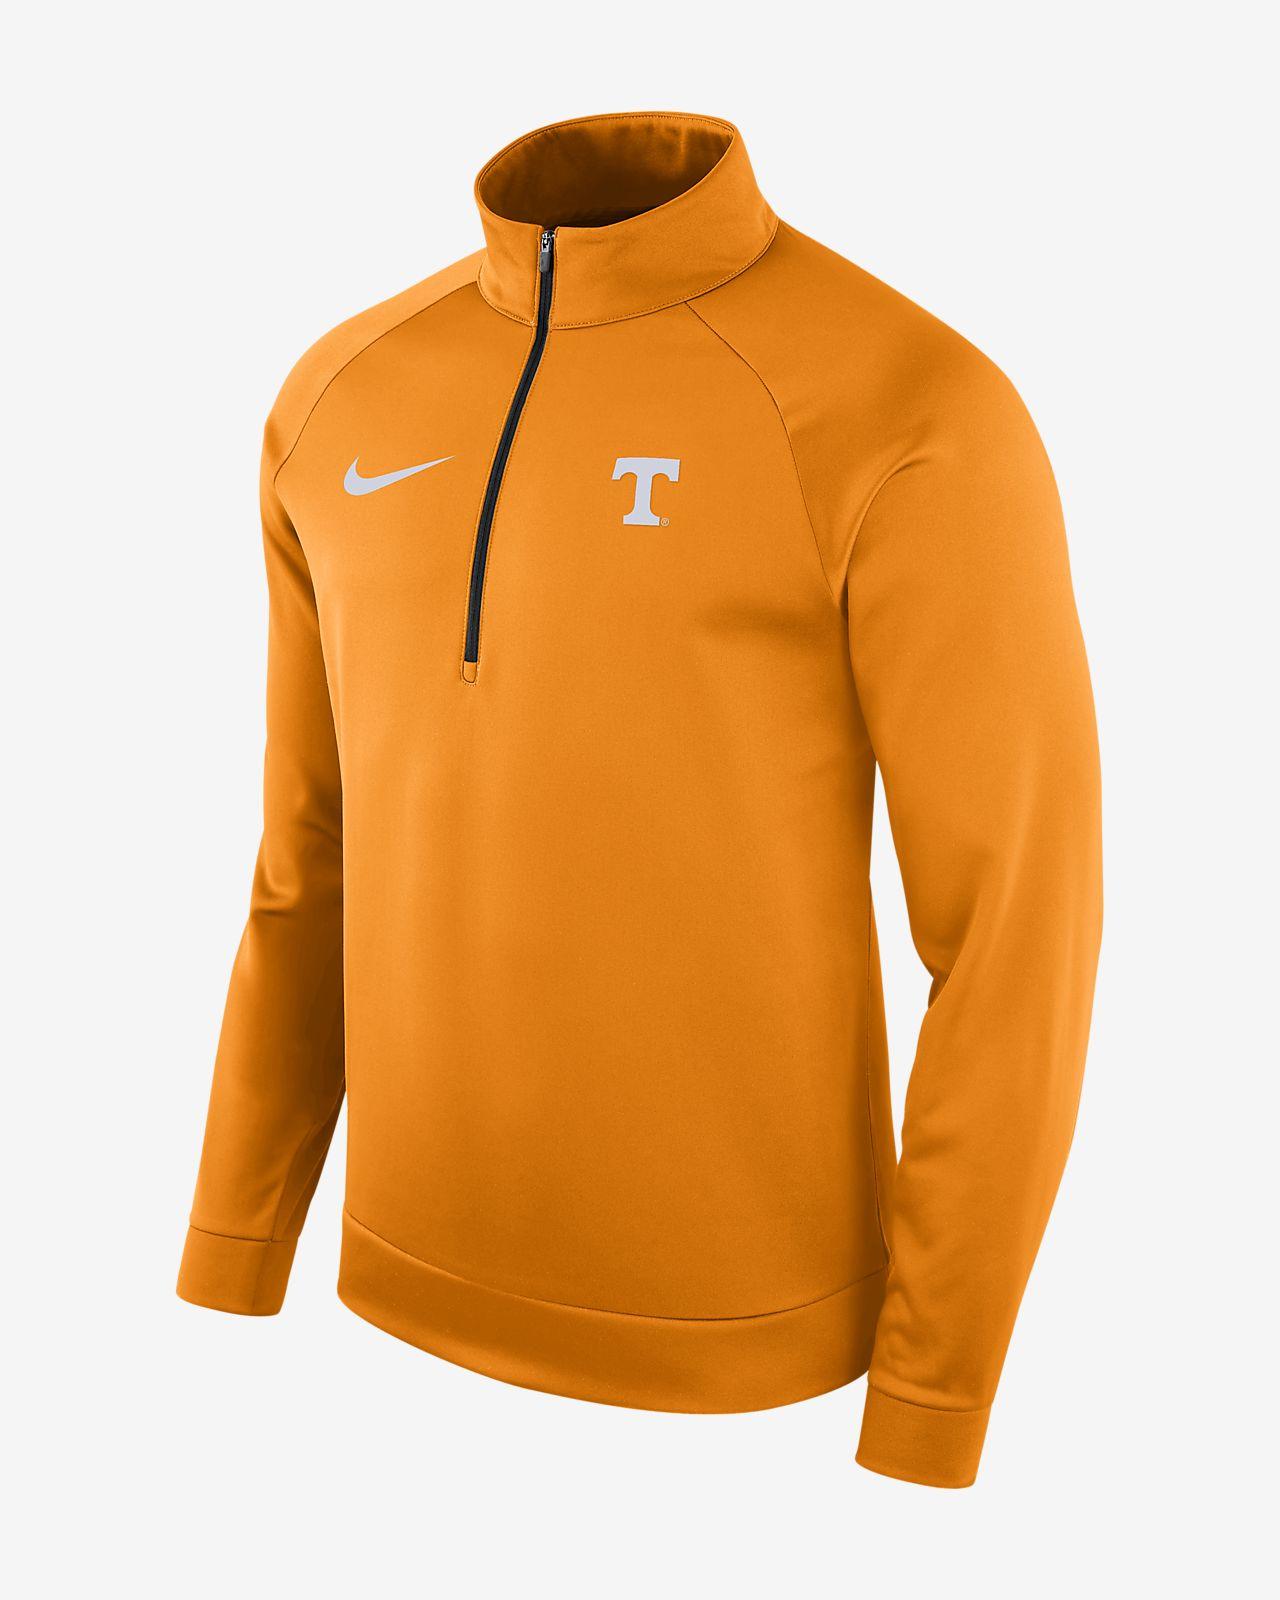 8cf31f0a67b8 Nike College Dri-FIT Therma (Tennessee) Men s Half-Zip Long Sleeve ...